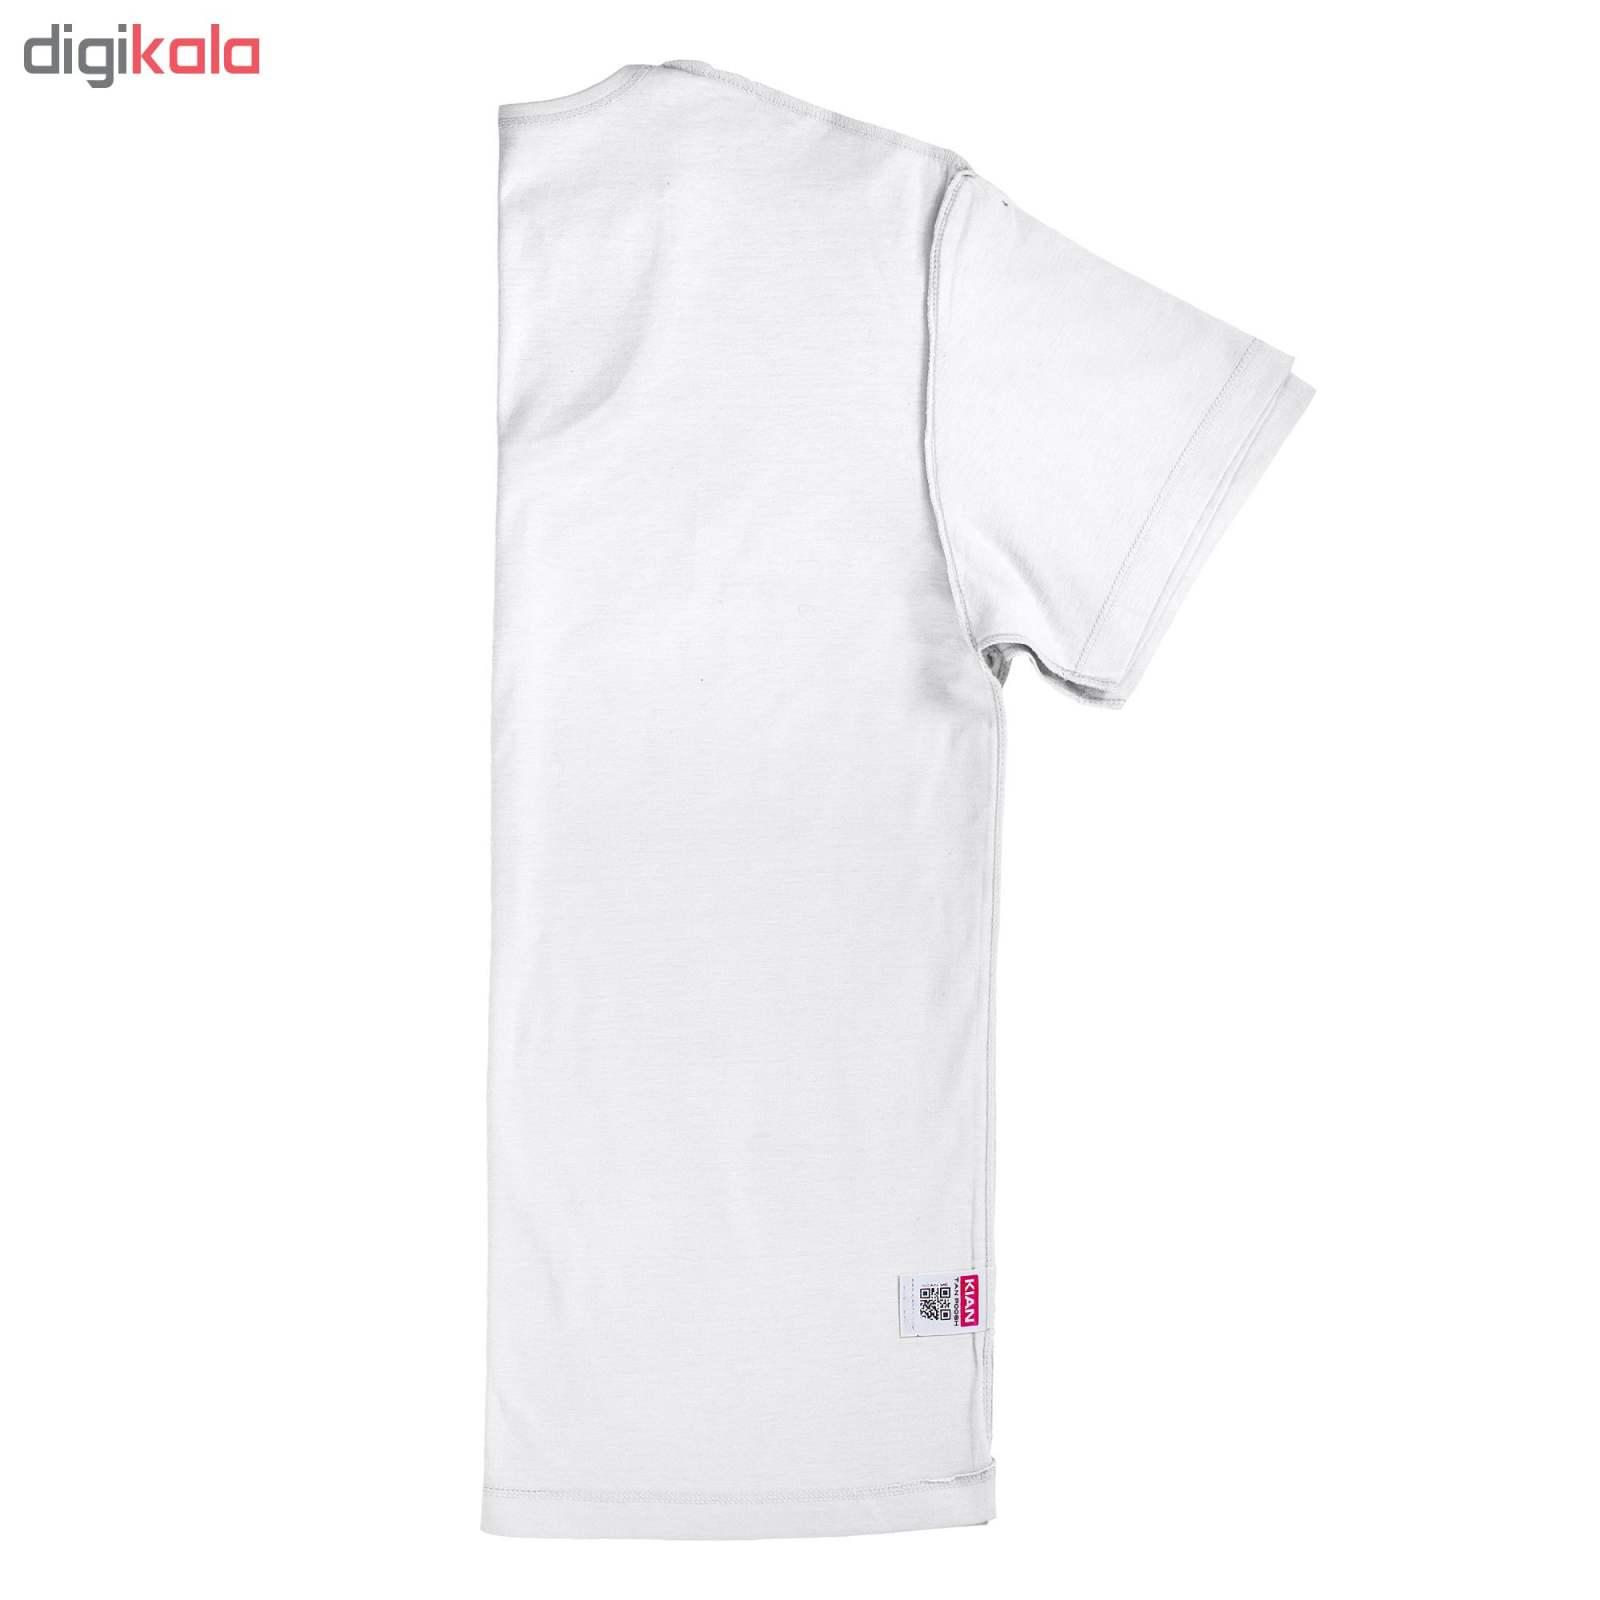 زیرپوش مردانه کیان تن پوش مدل U Neck Shirt Classic W main 1 3